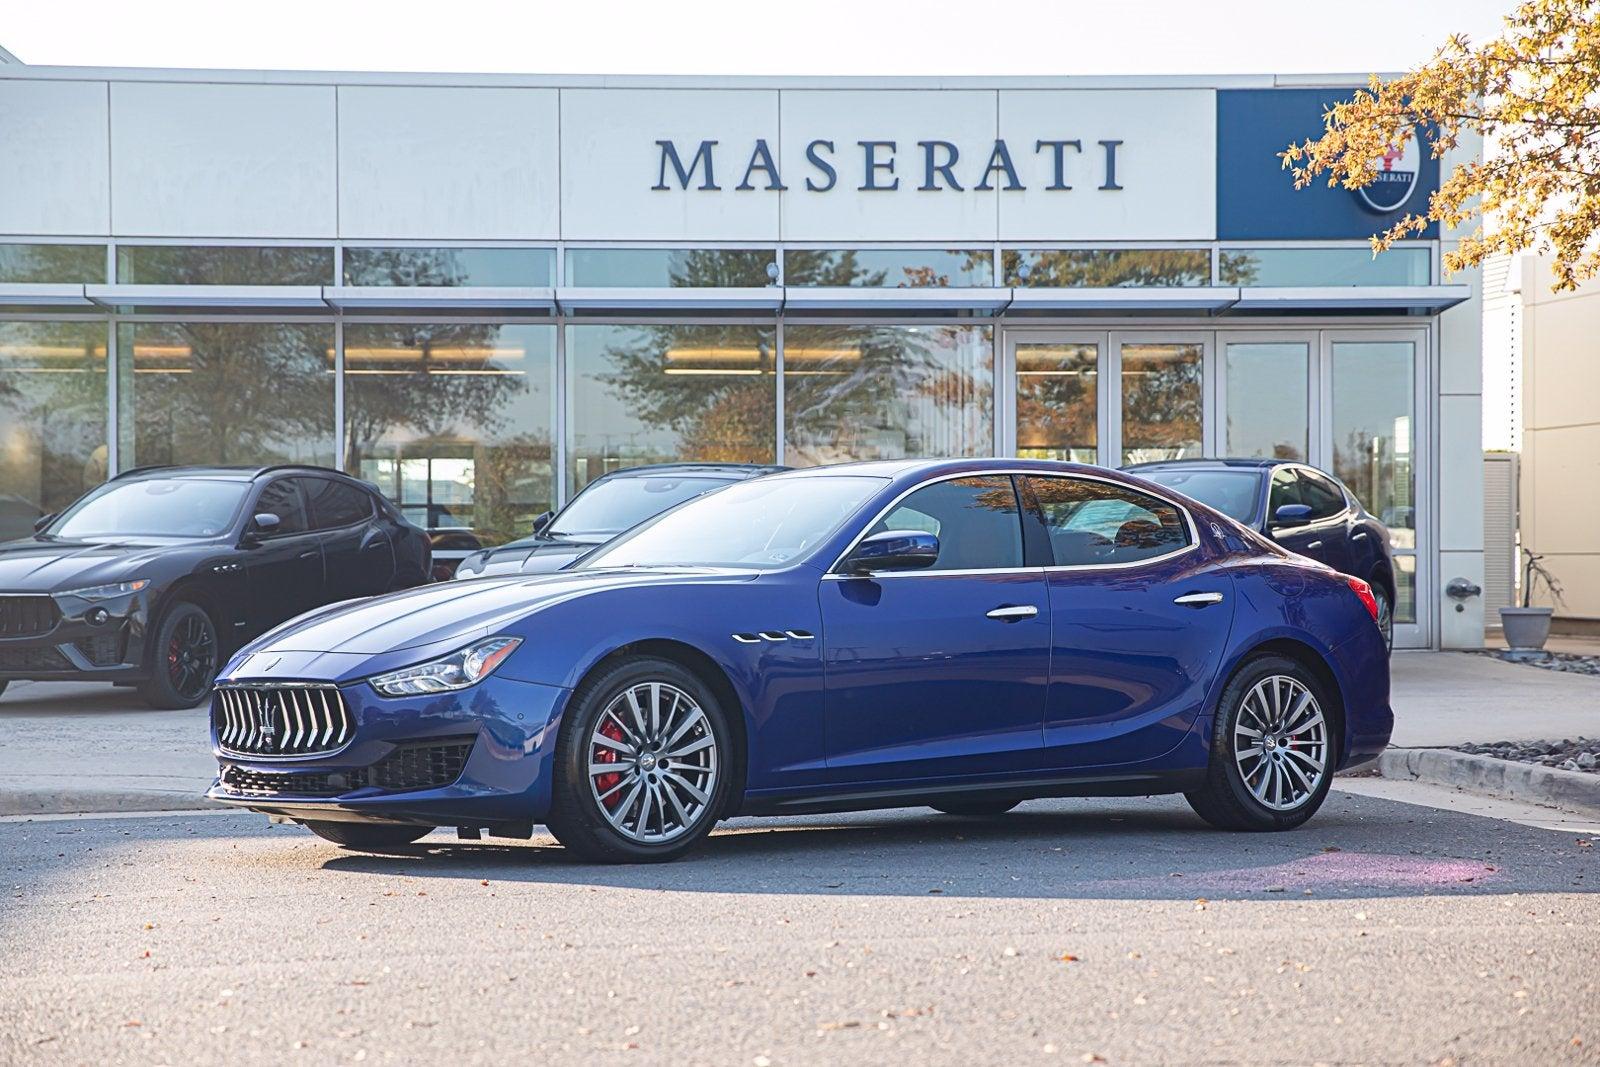 Maserati Q4 Price >> 2019 Maserati Blu Emozione Ghibli S Q4 For Sale Maserati Washington Dc